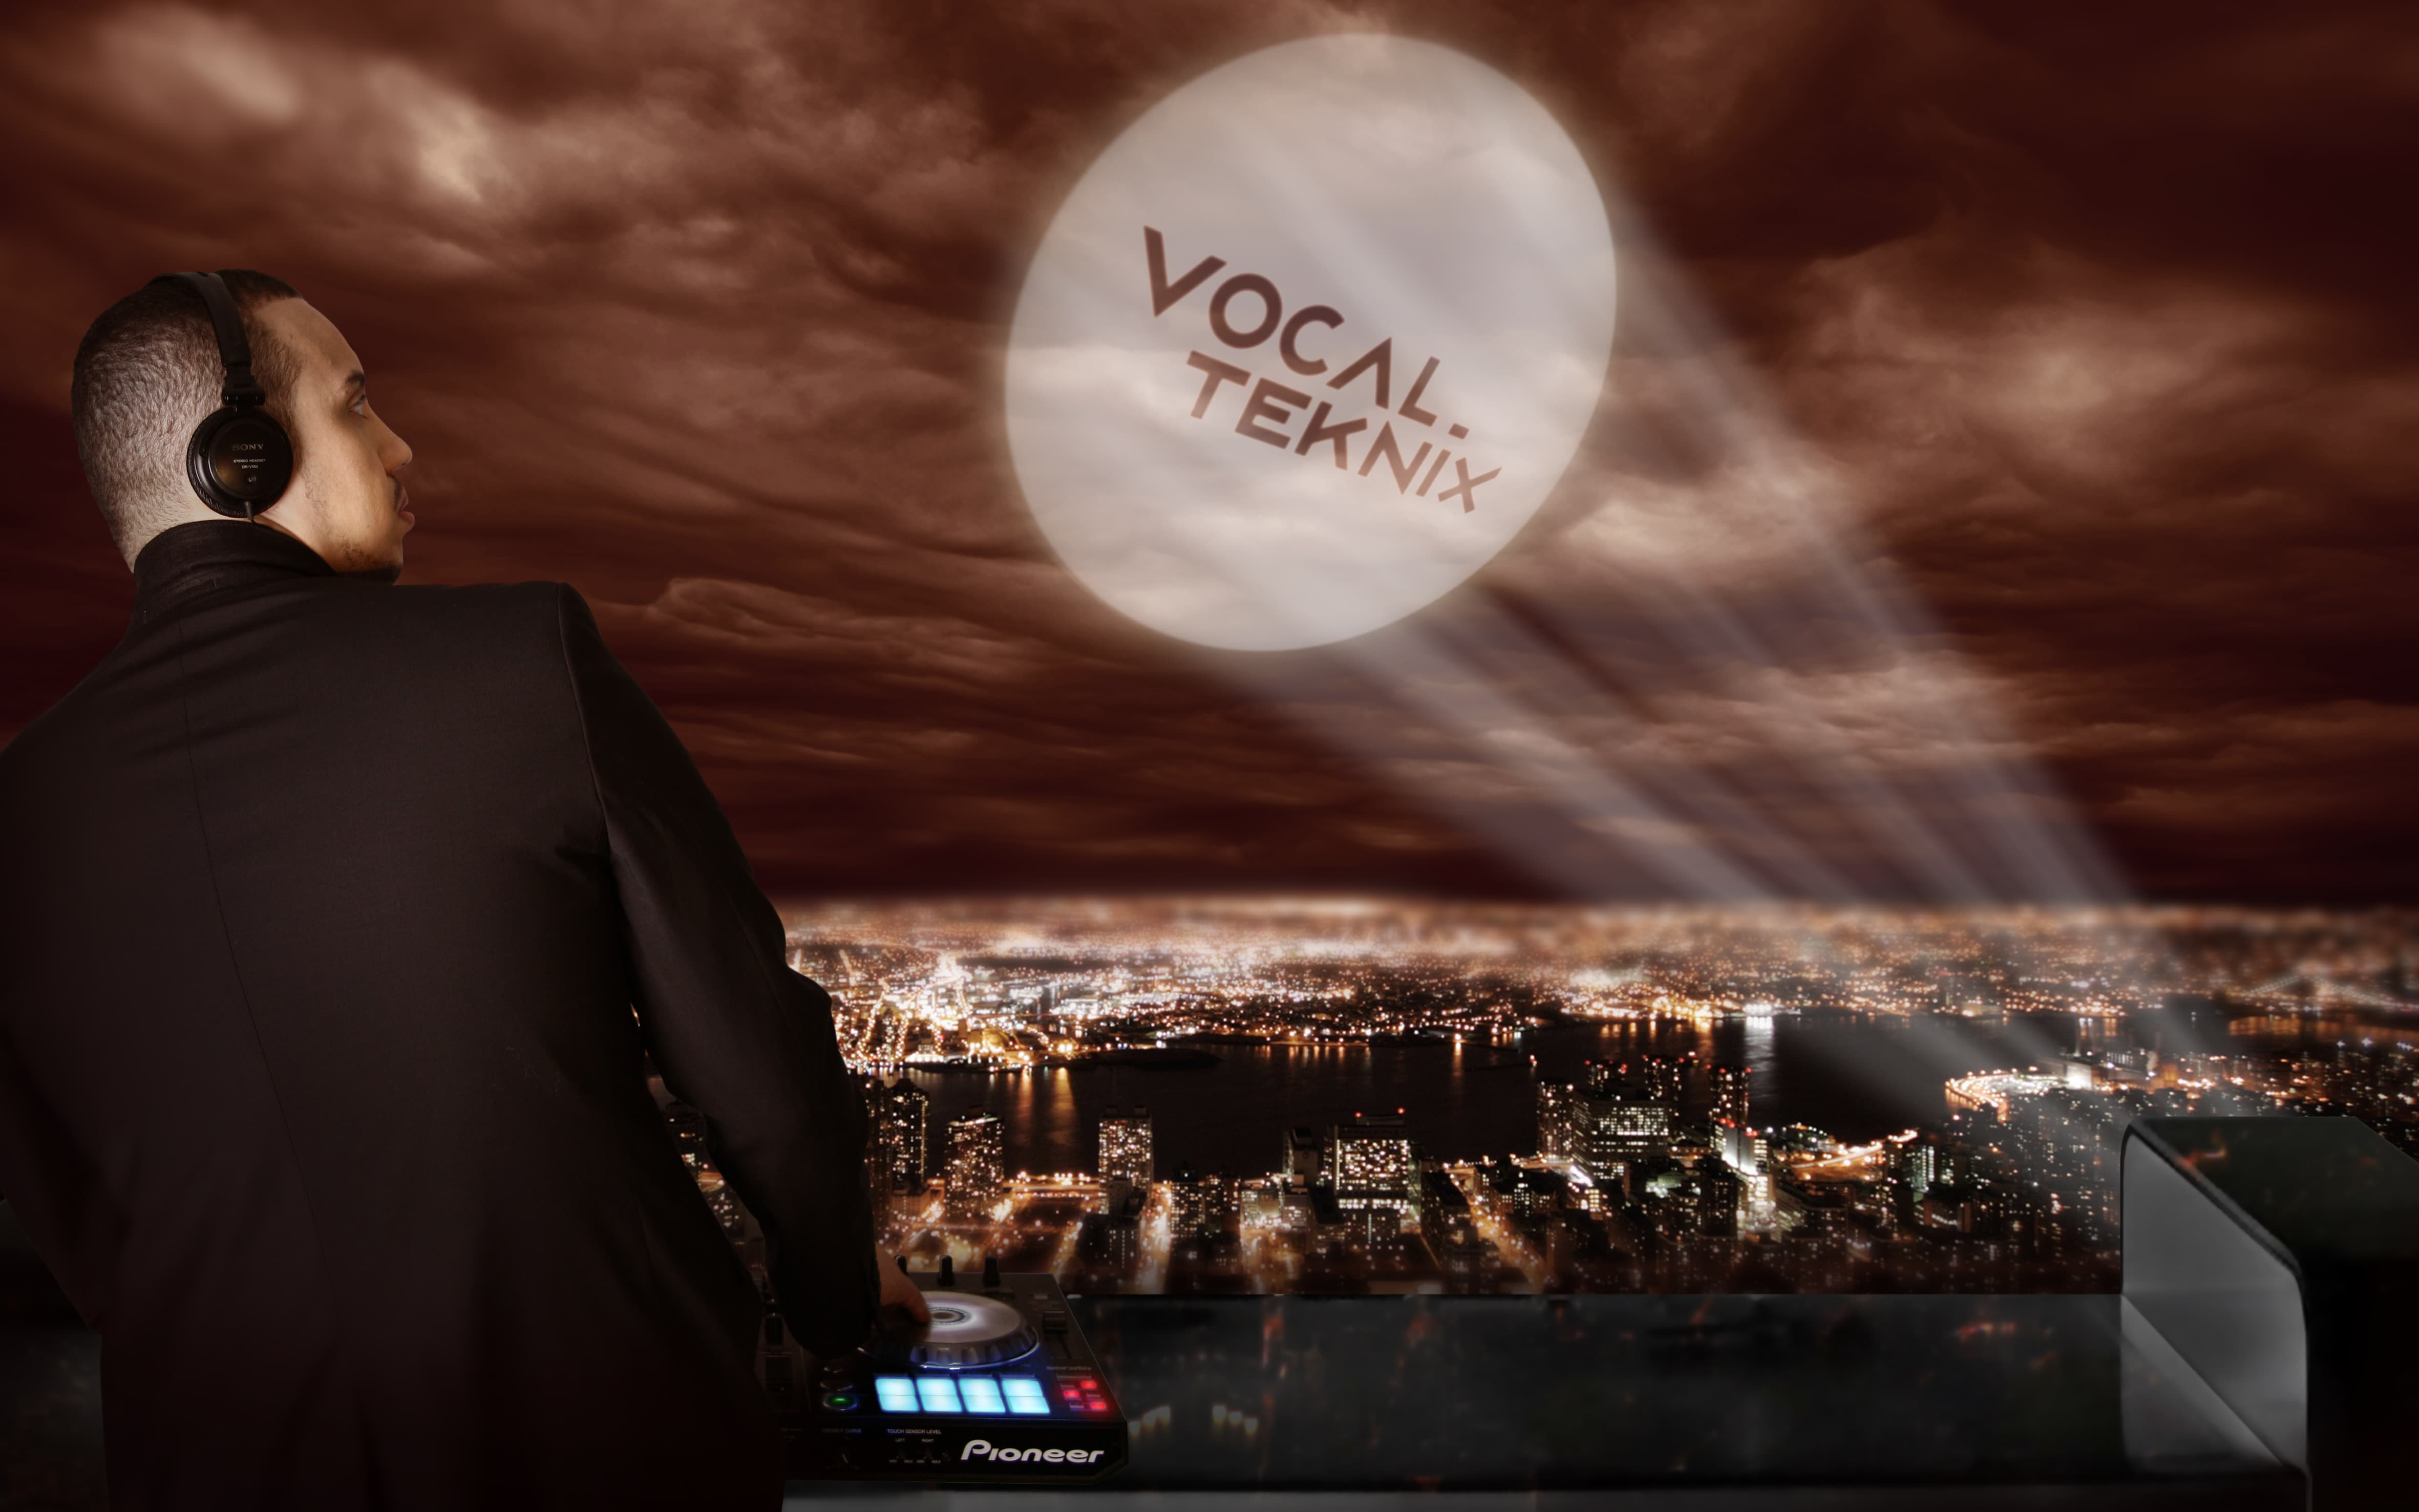 vocal_signal